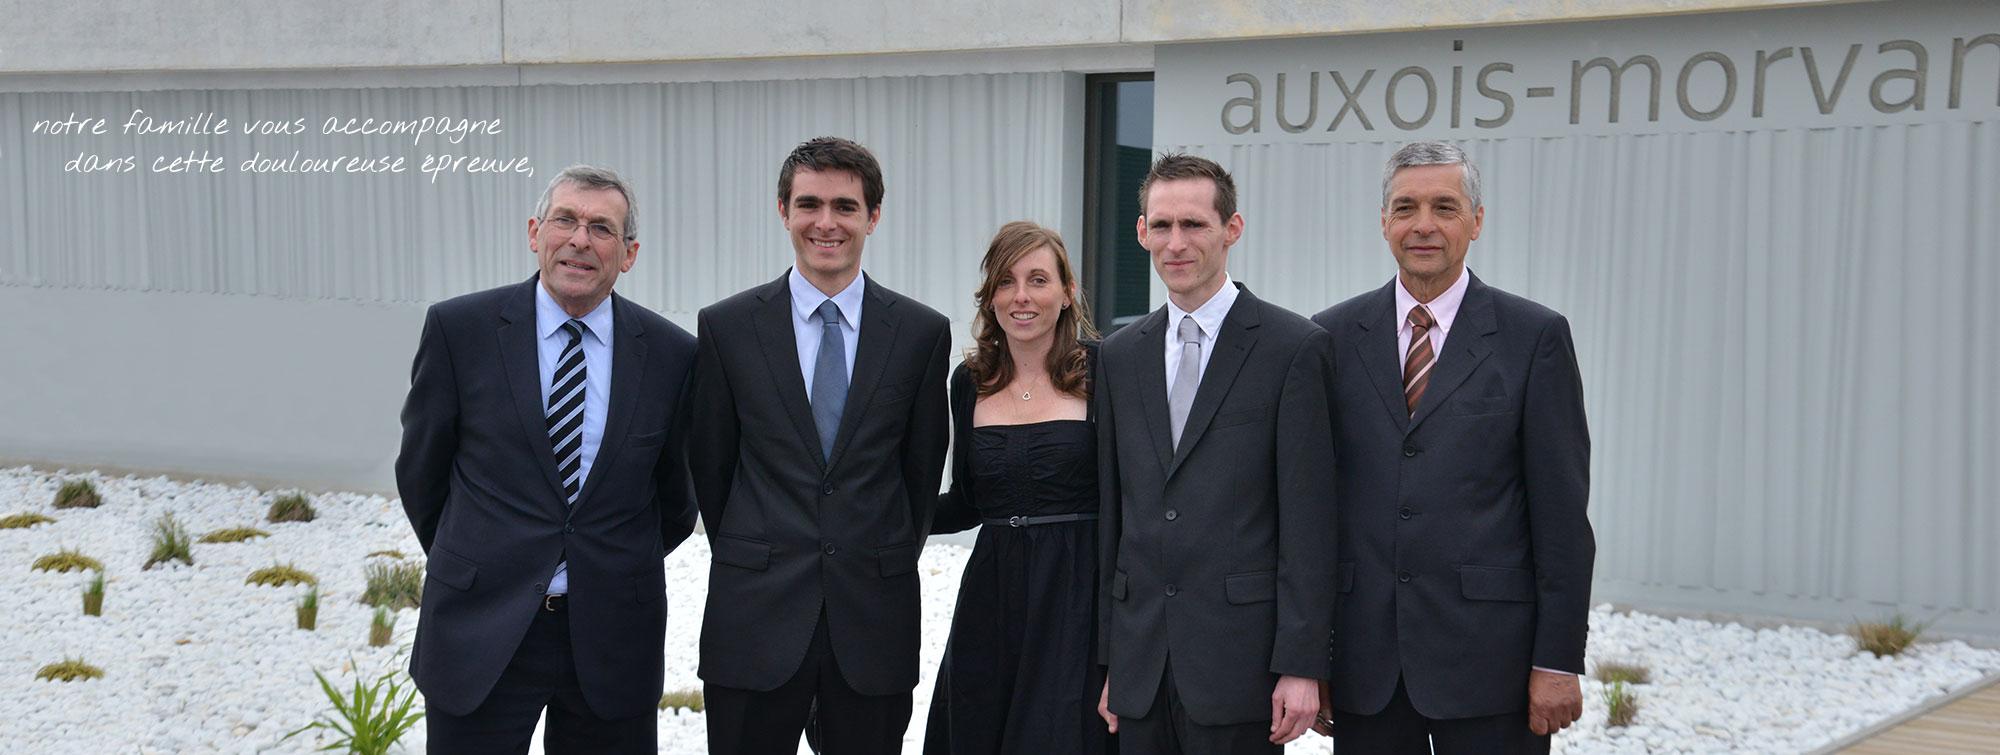 famille-girard-pompes-funebres-girard-semur-en-auxois